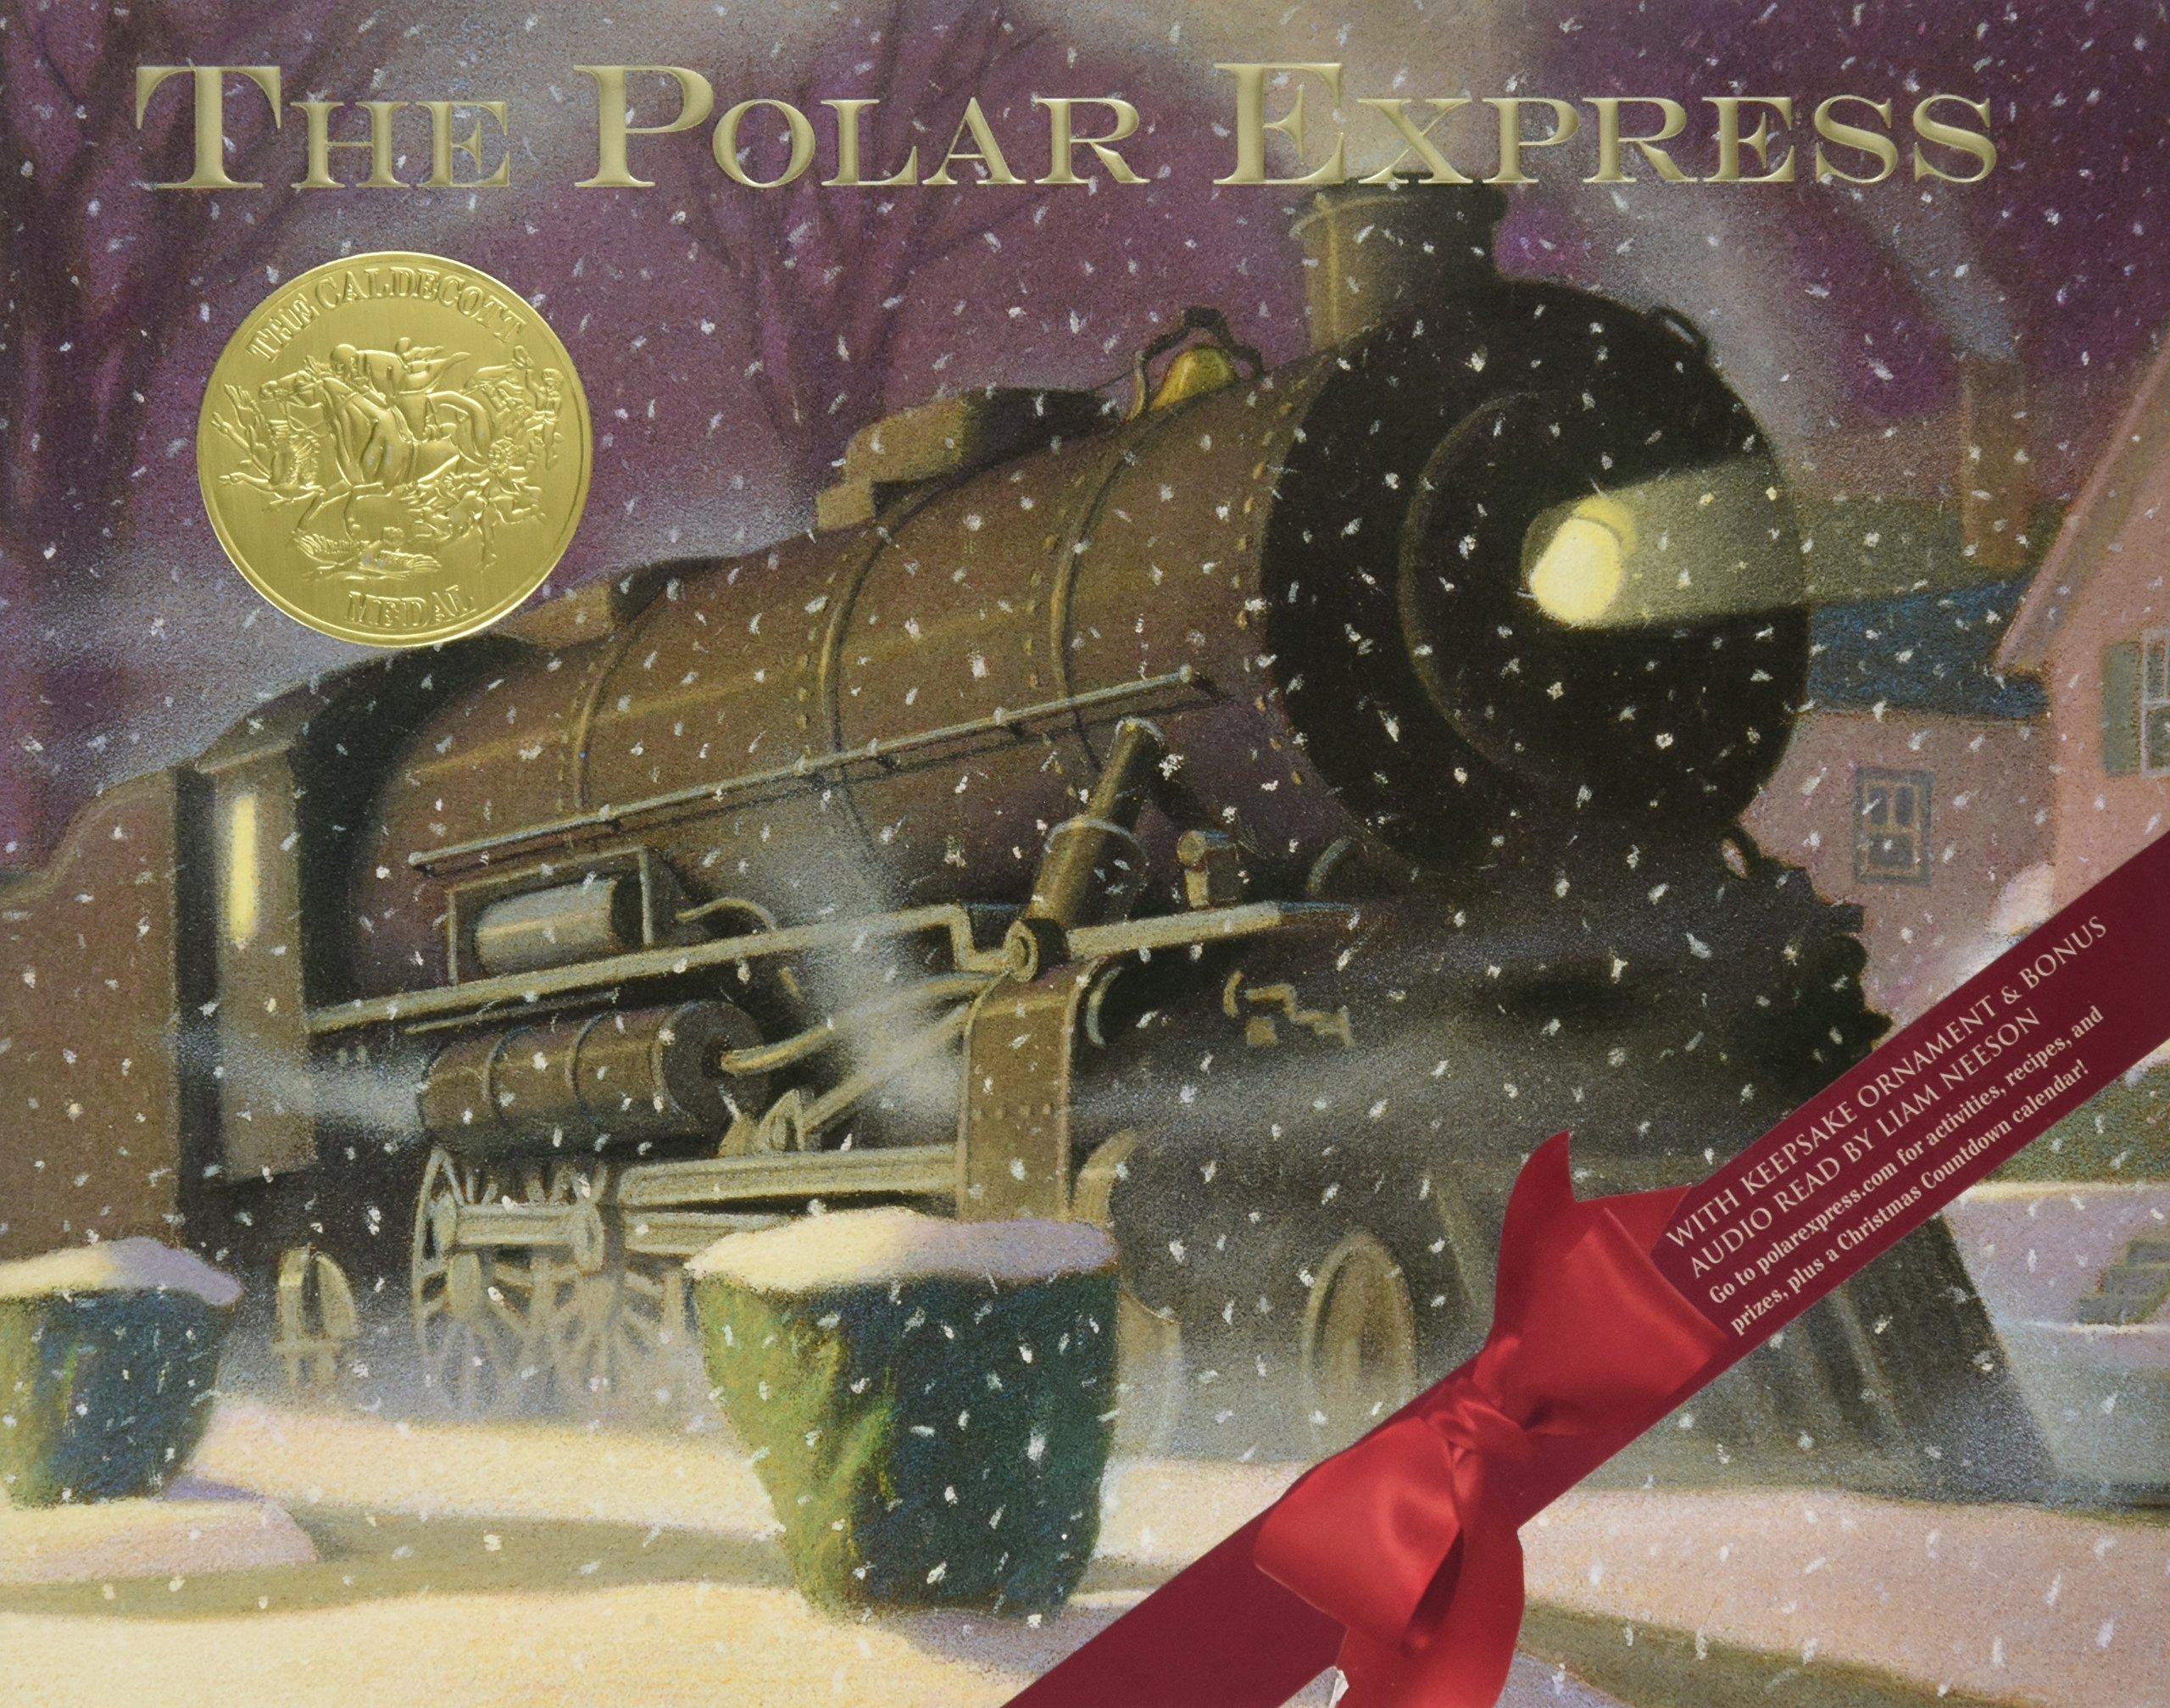 Polar Express 30th anniversary edition: Van Allsburg, Chris: 9780544580145: Amazon.com: Books